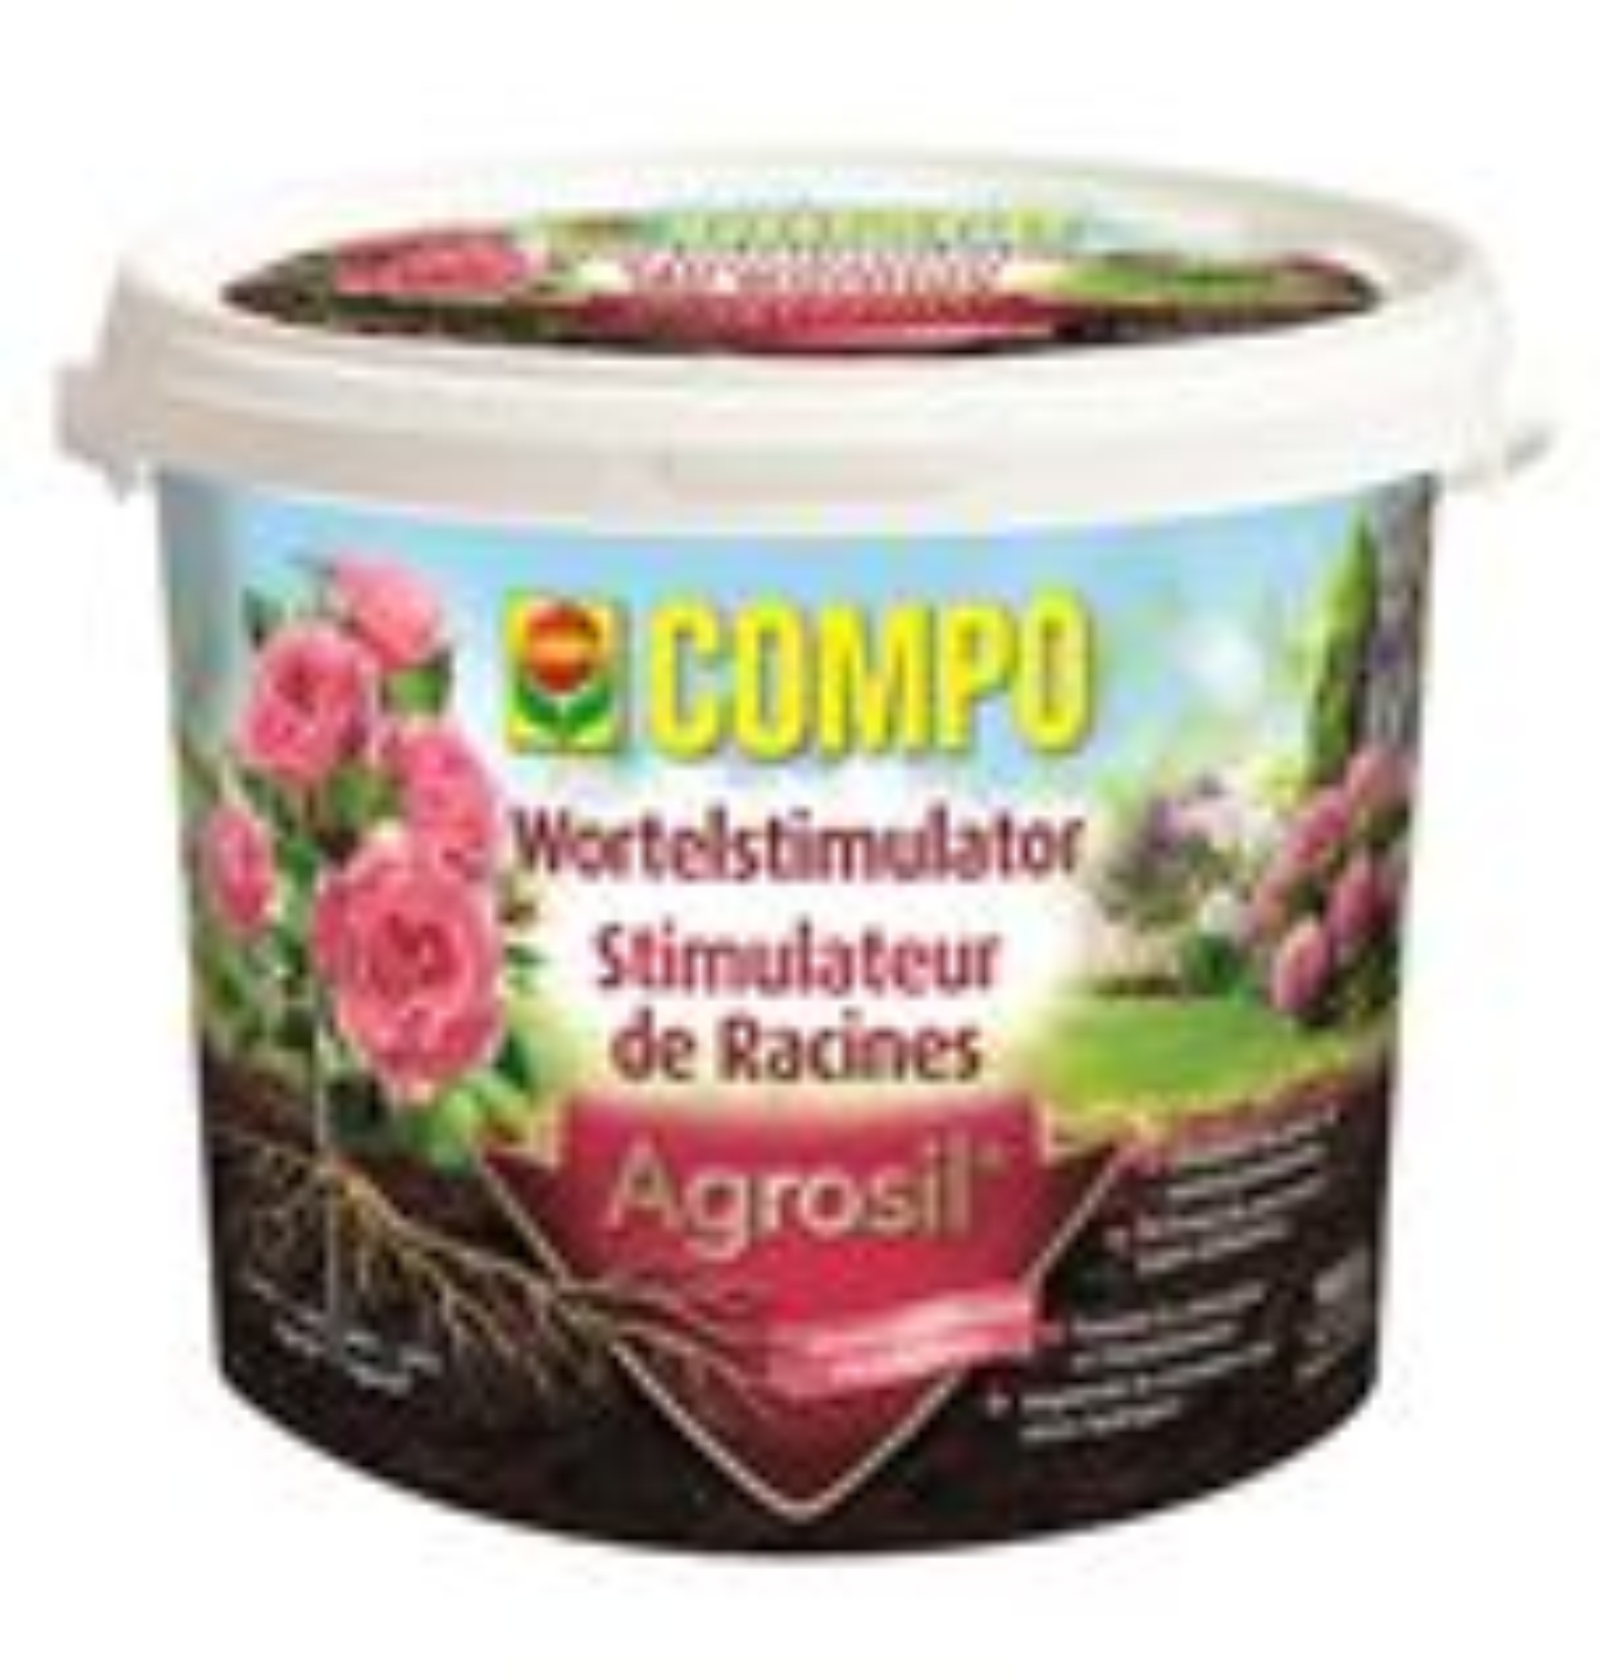 Compo agrosil wortelstimulator - 900gr